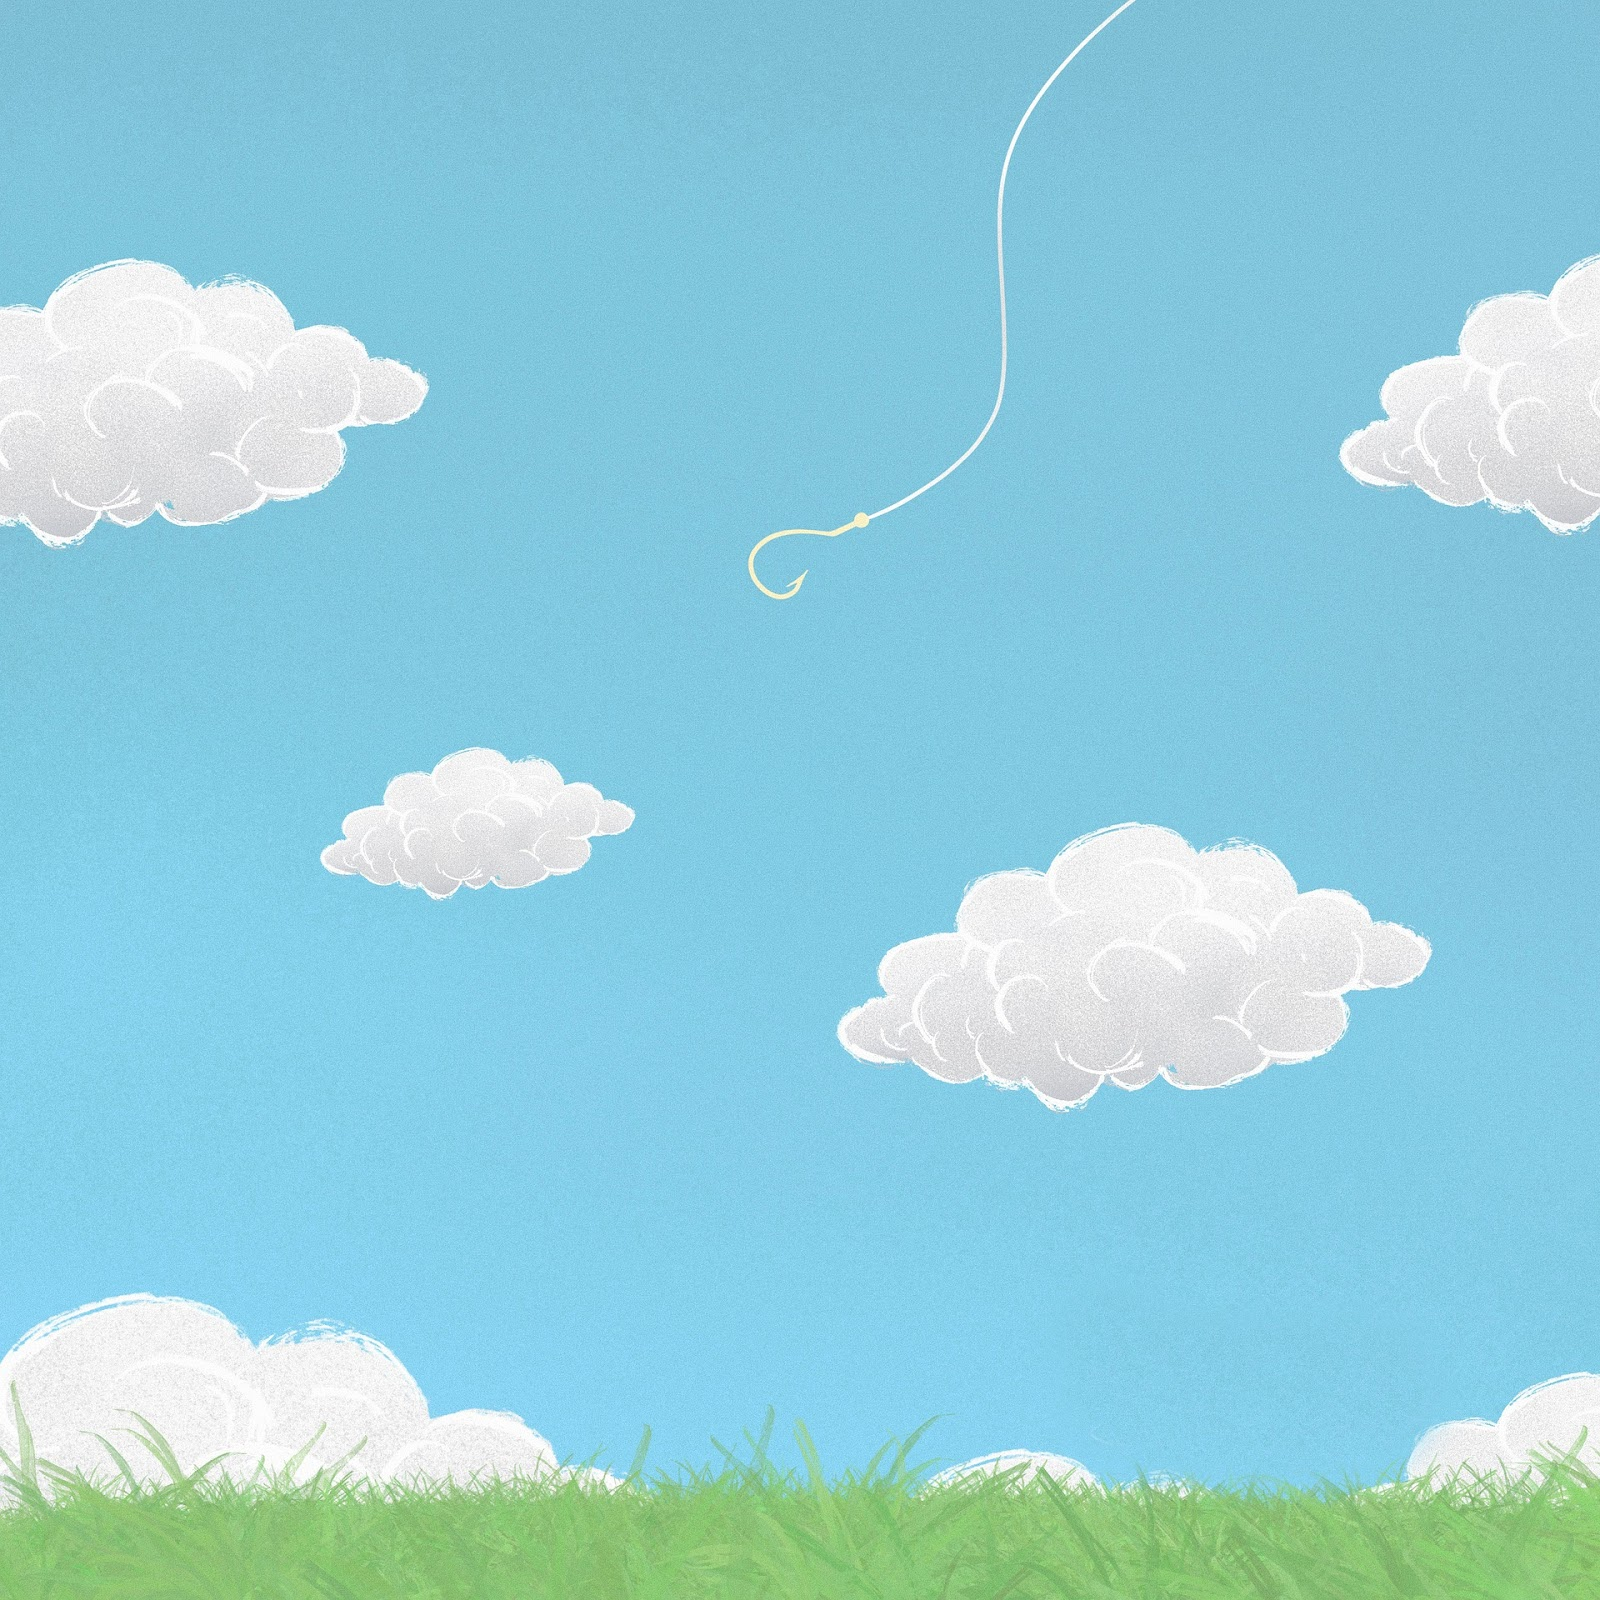 sky with hook